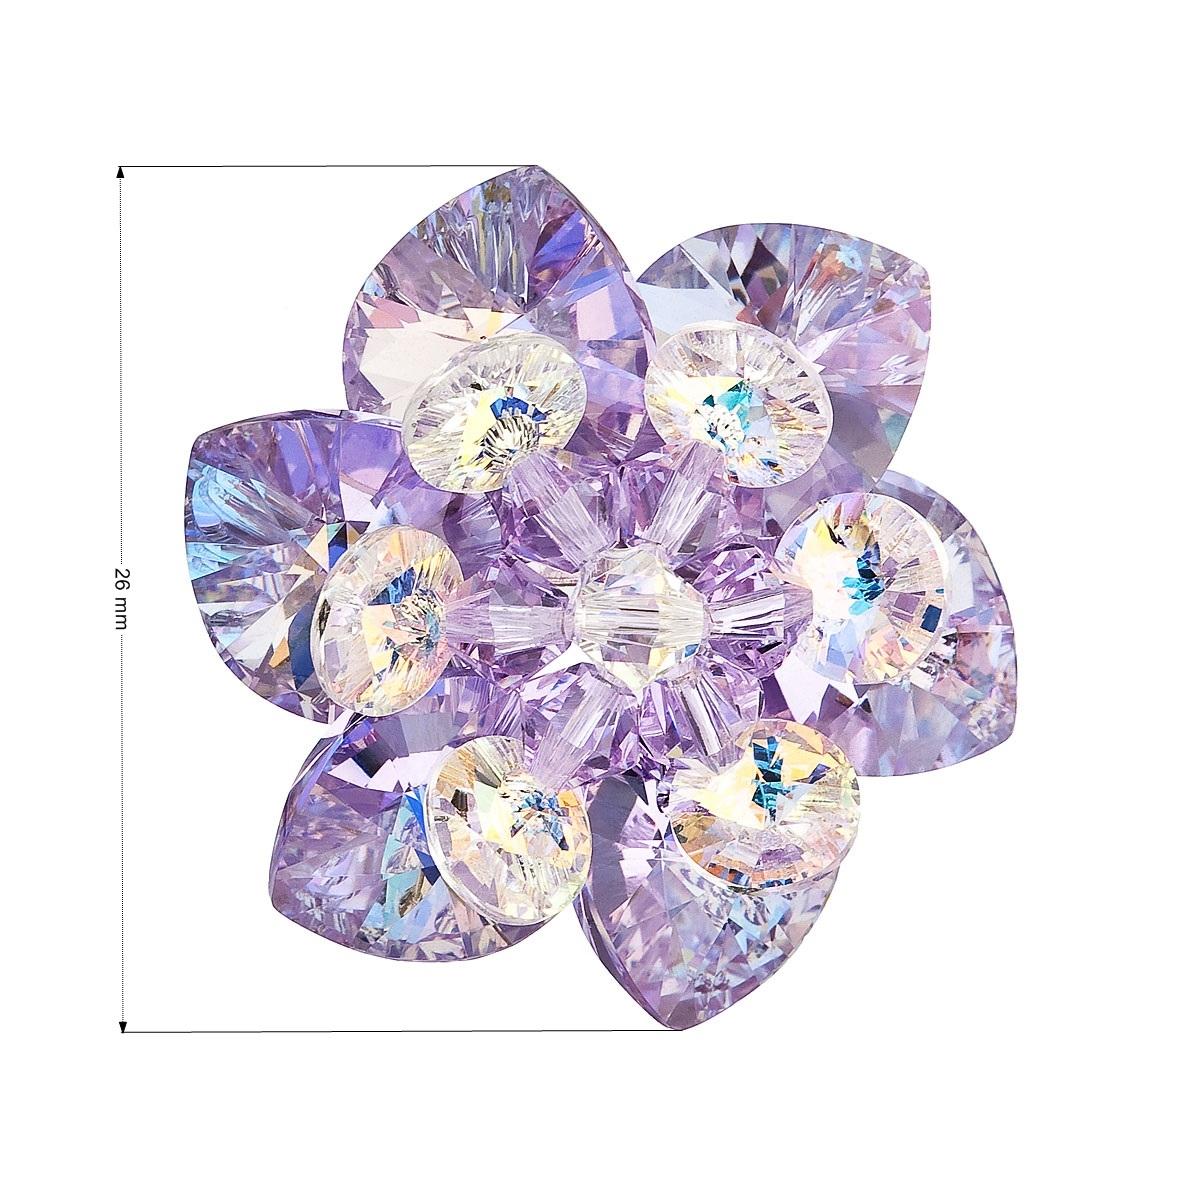 Brošňa kvietok s kamienkami Crystals From Swarovski ®